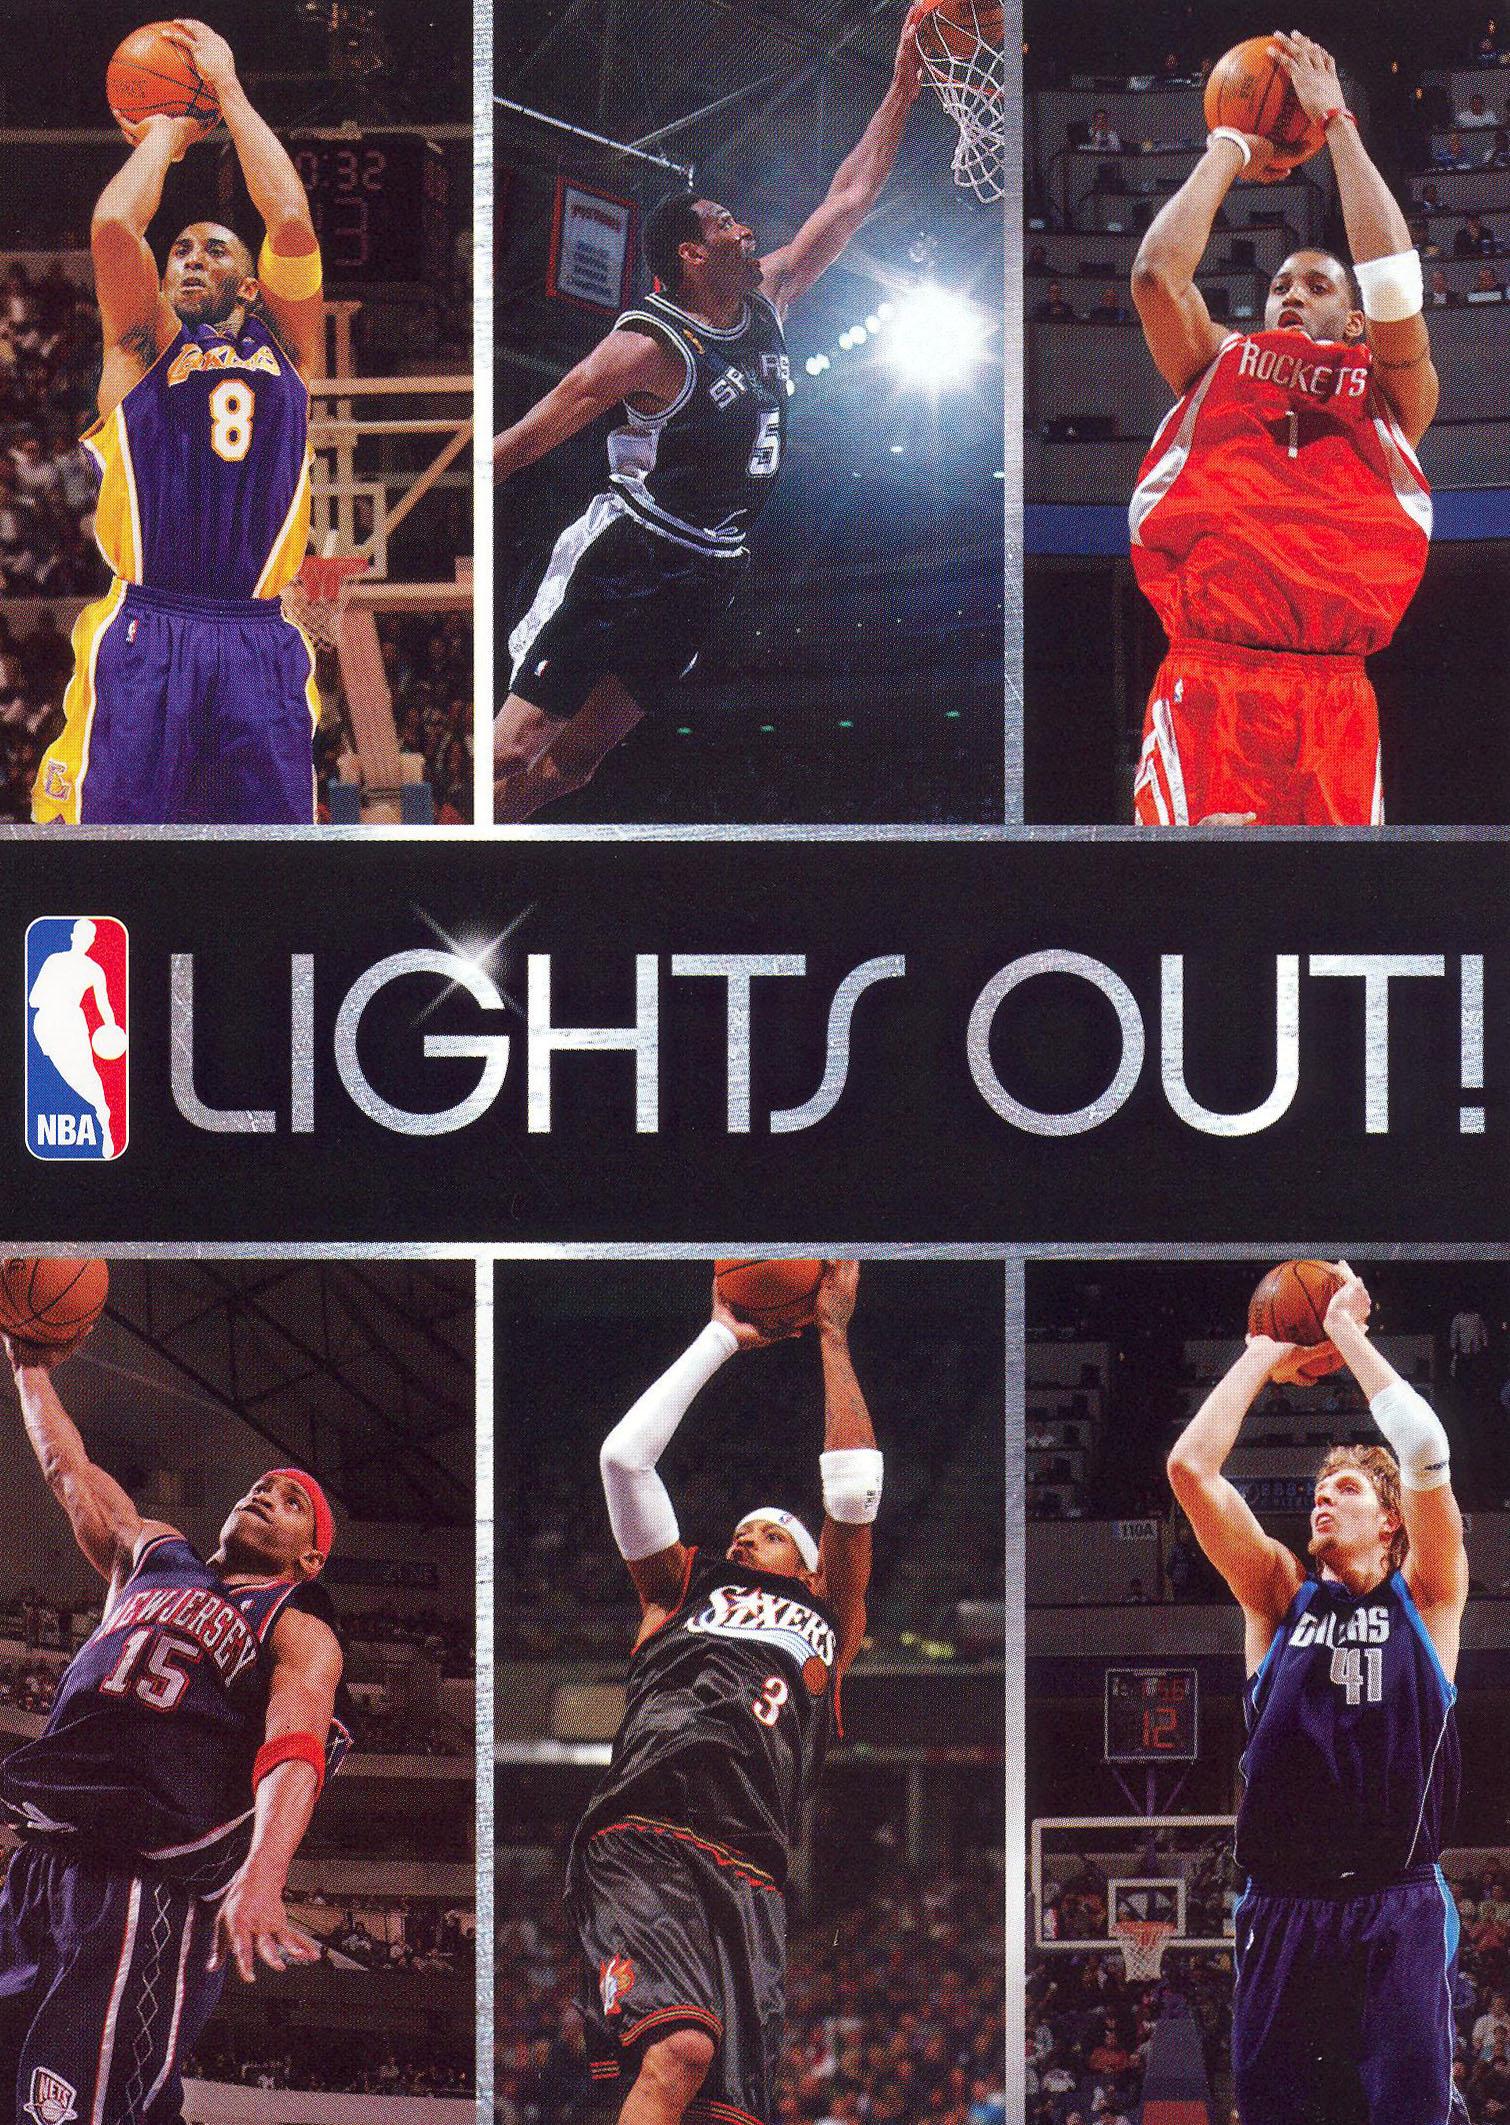 NBA: Lights Out!